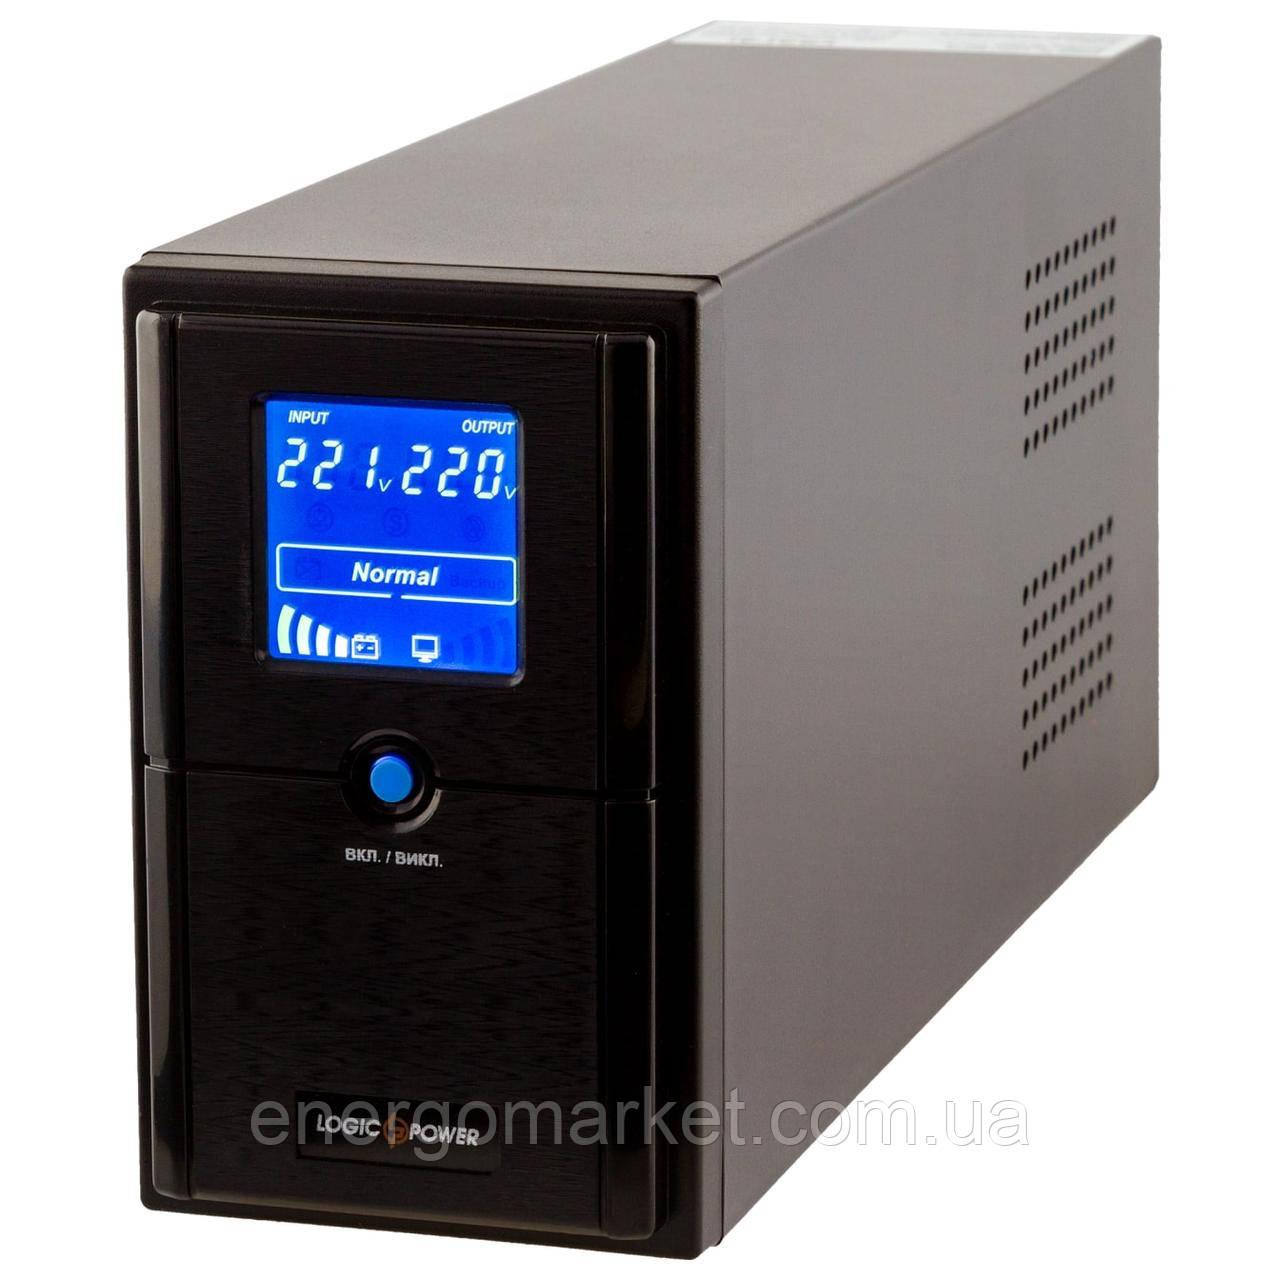 Линейно-интерактивный ИБП Logic Power LPM-L625VA (437Вт) LCD